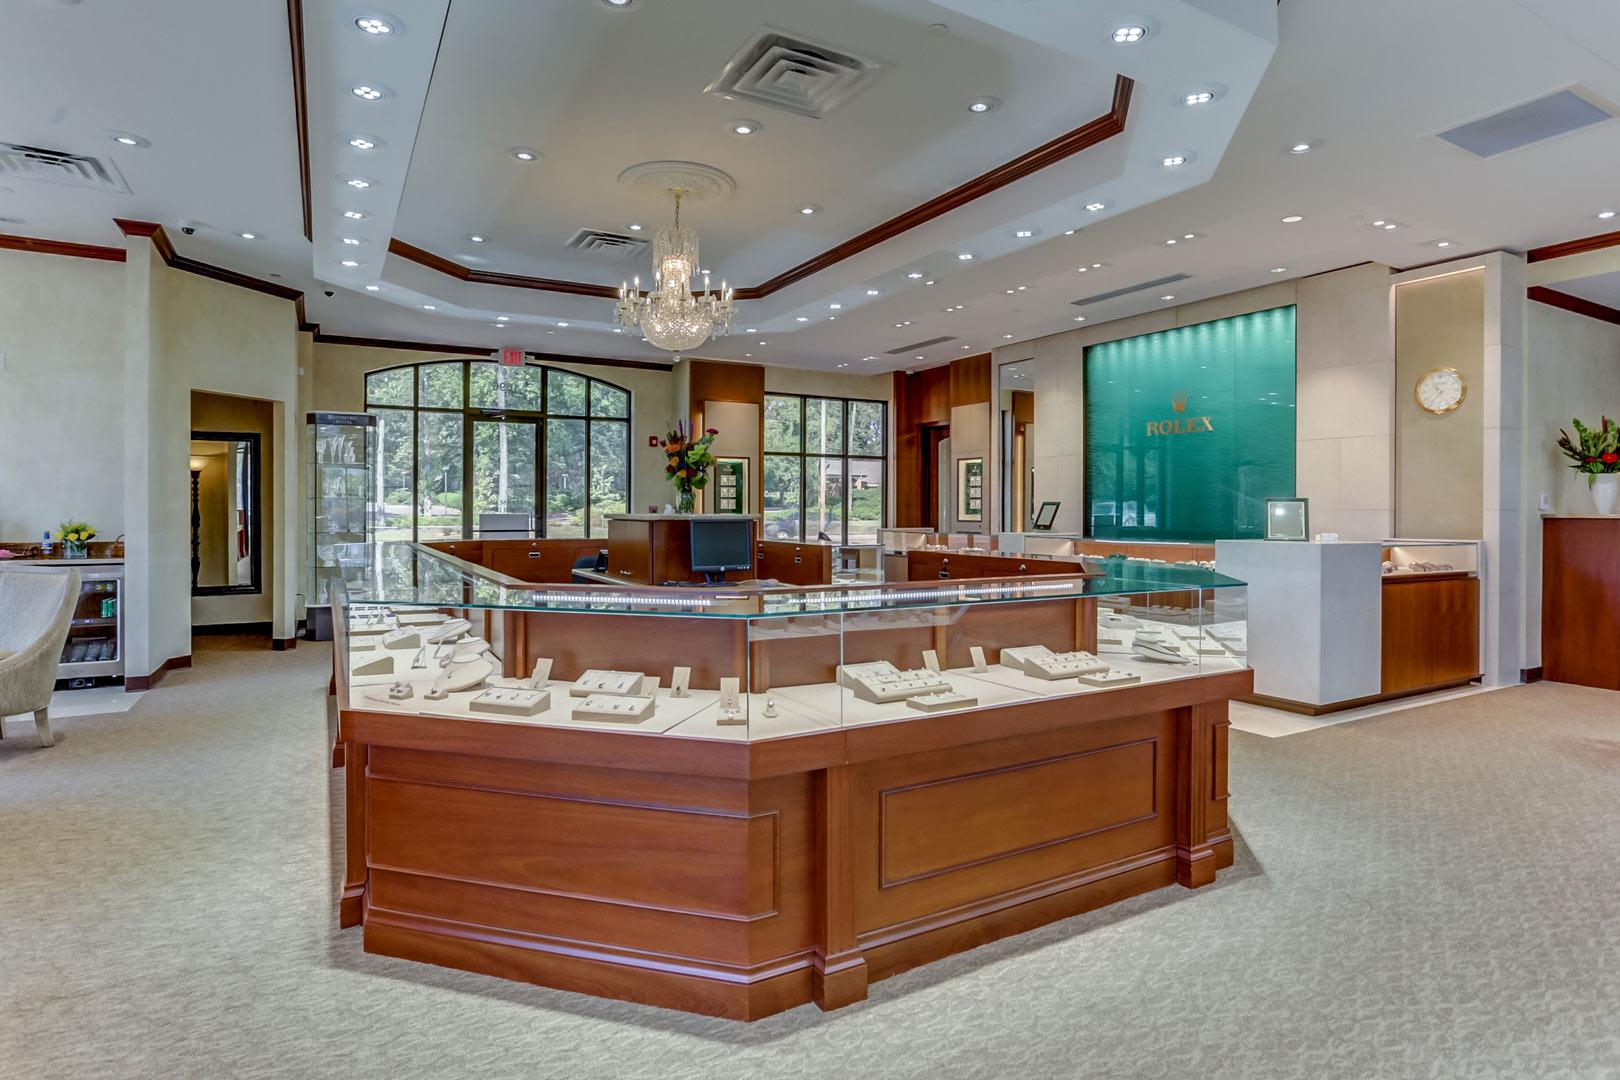 Albertine-Commercial-Bob-Richards-Jewelers-07.jpg